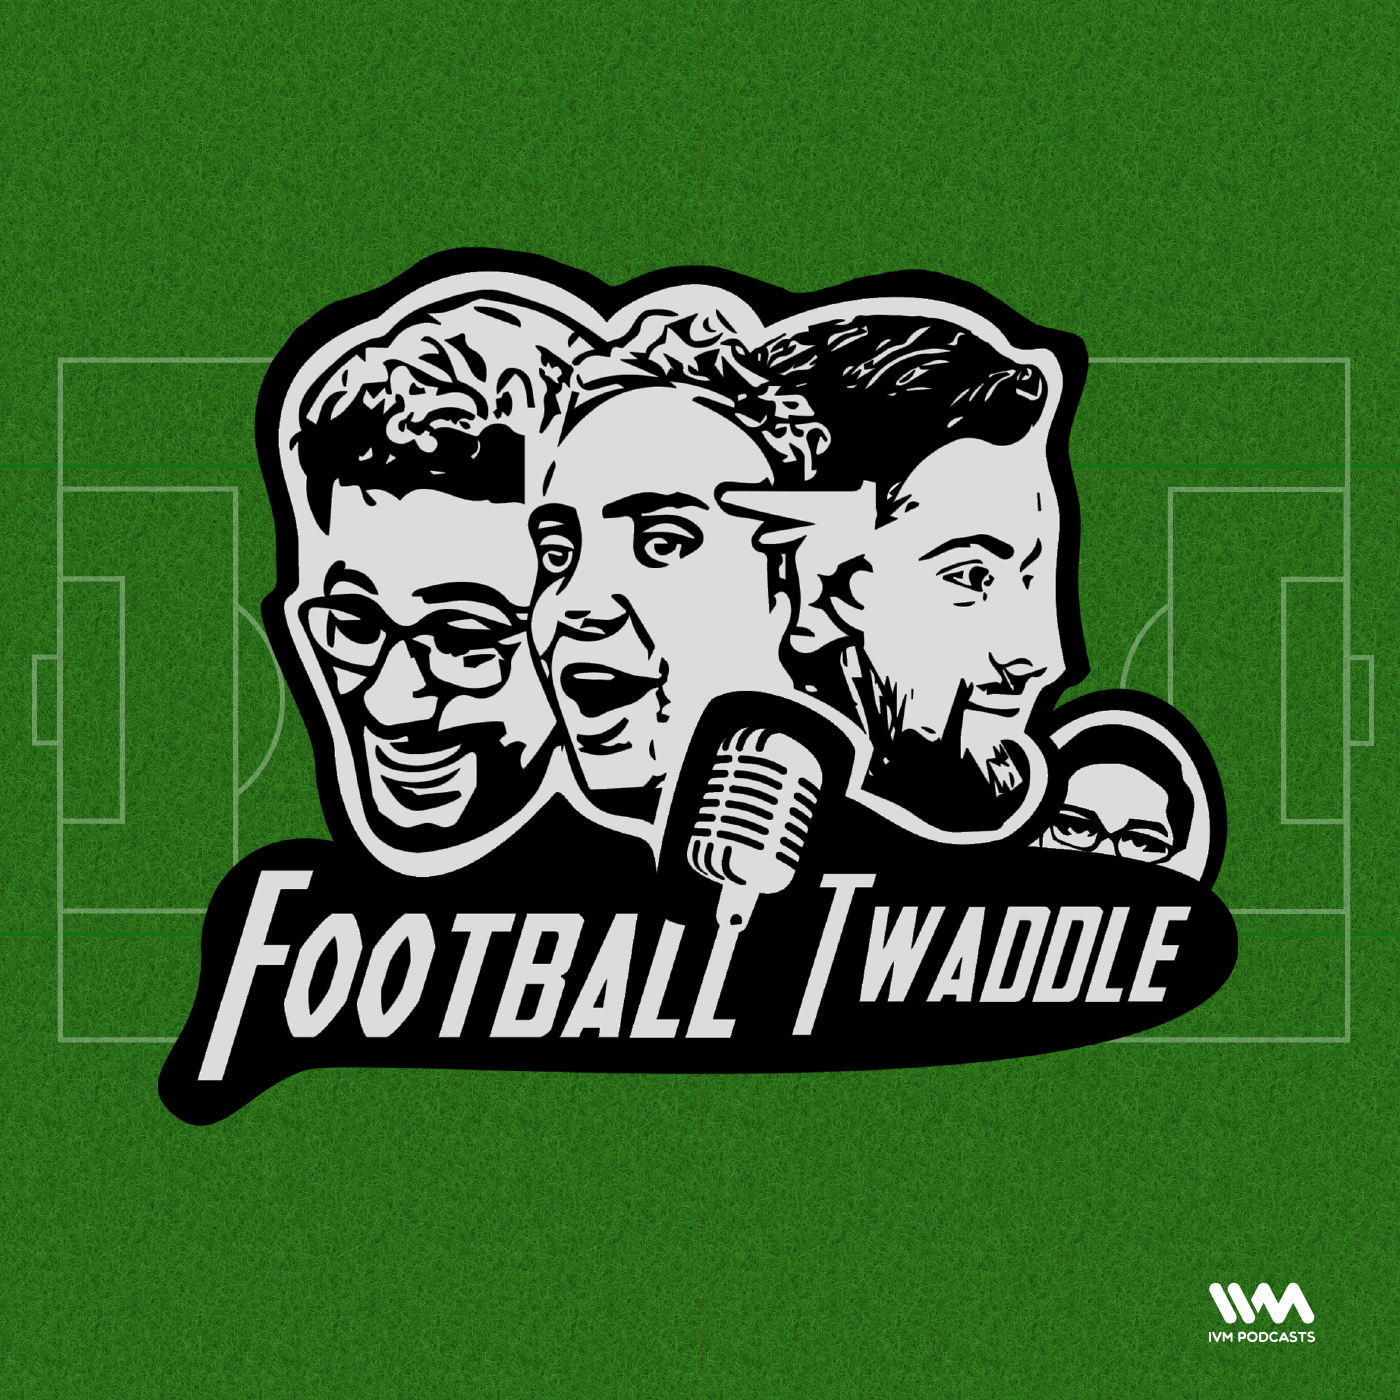 Football Twaddle